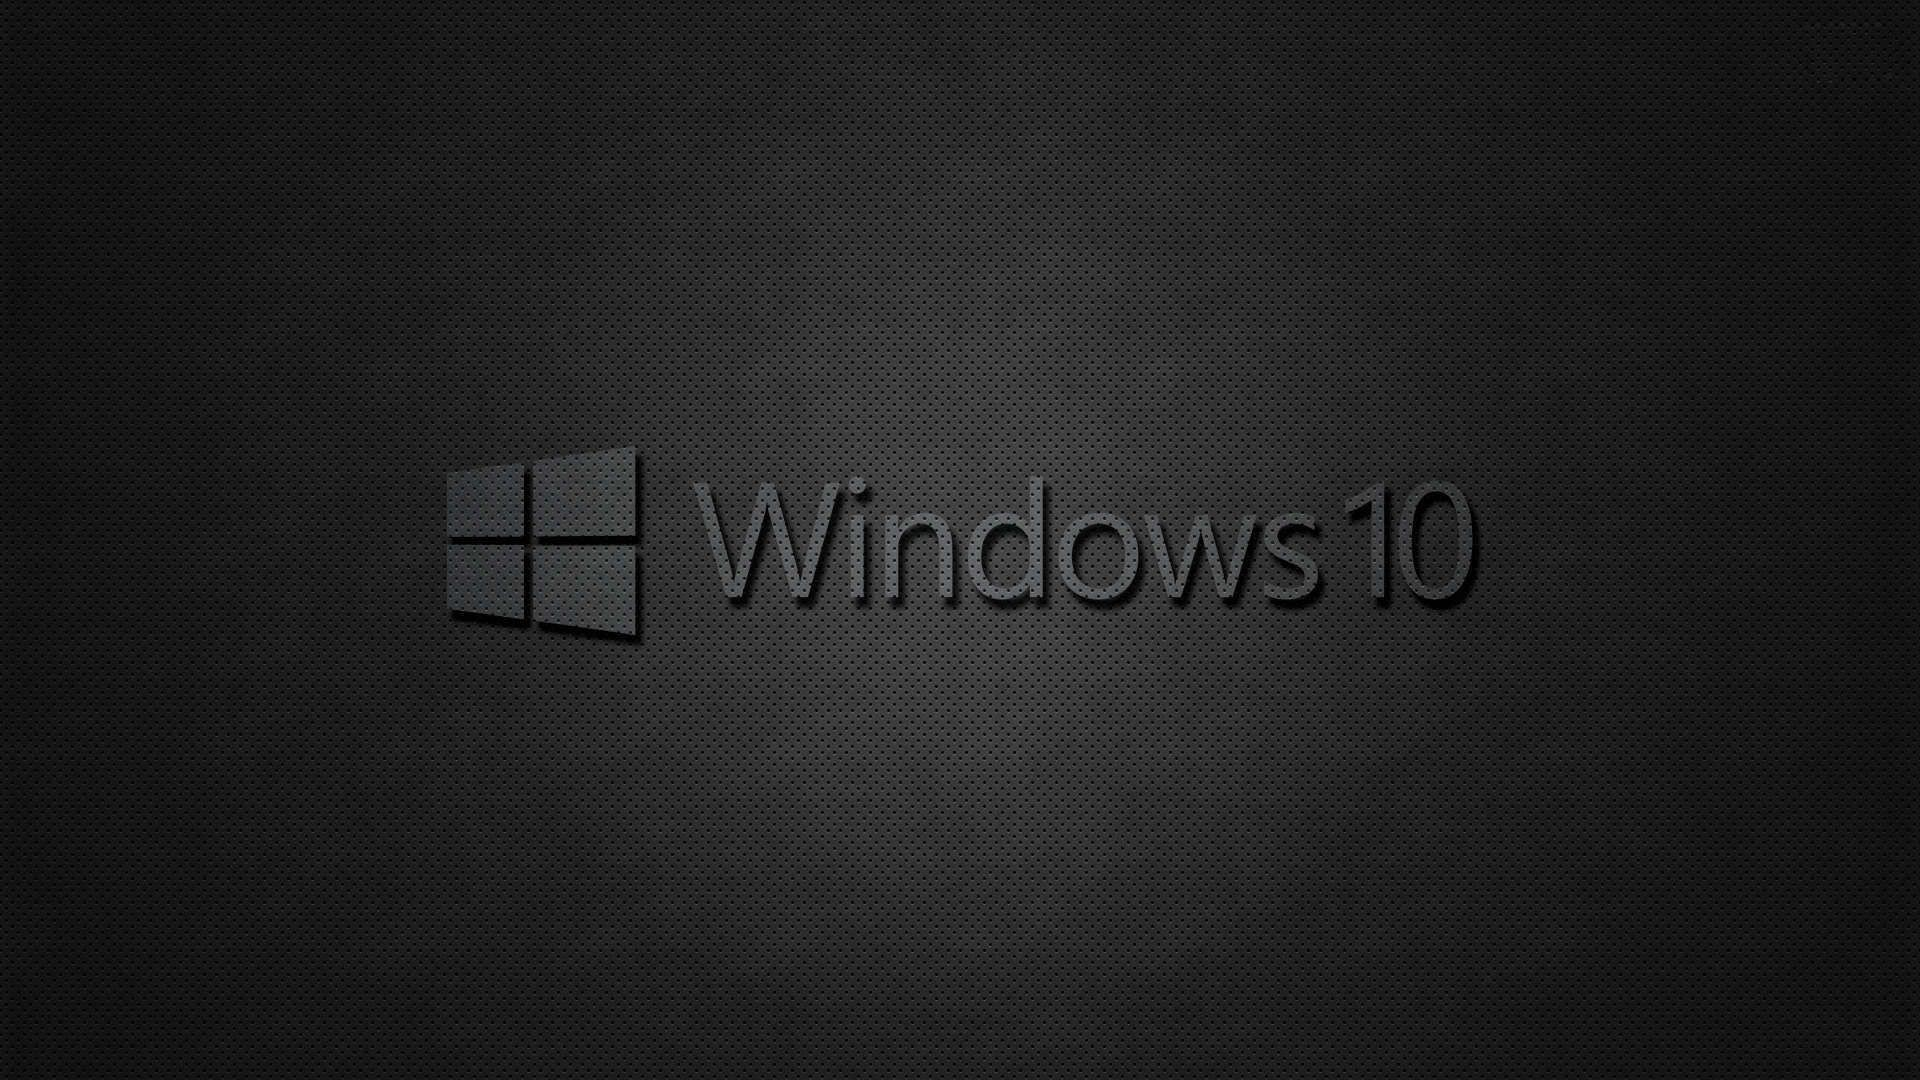 Windows 10 Hd Dark Wallpaper 83 Images